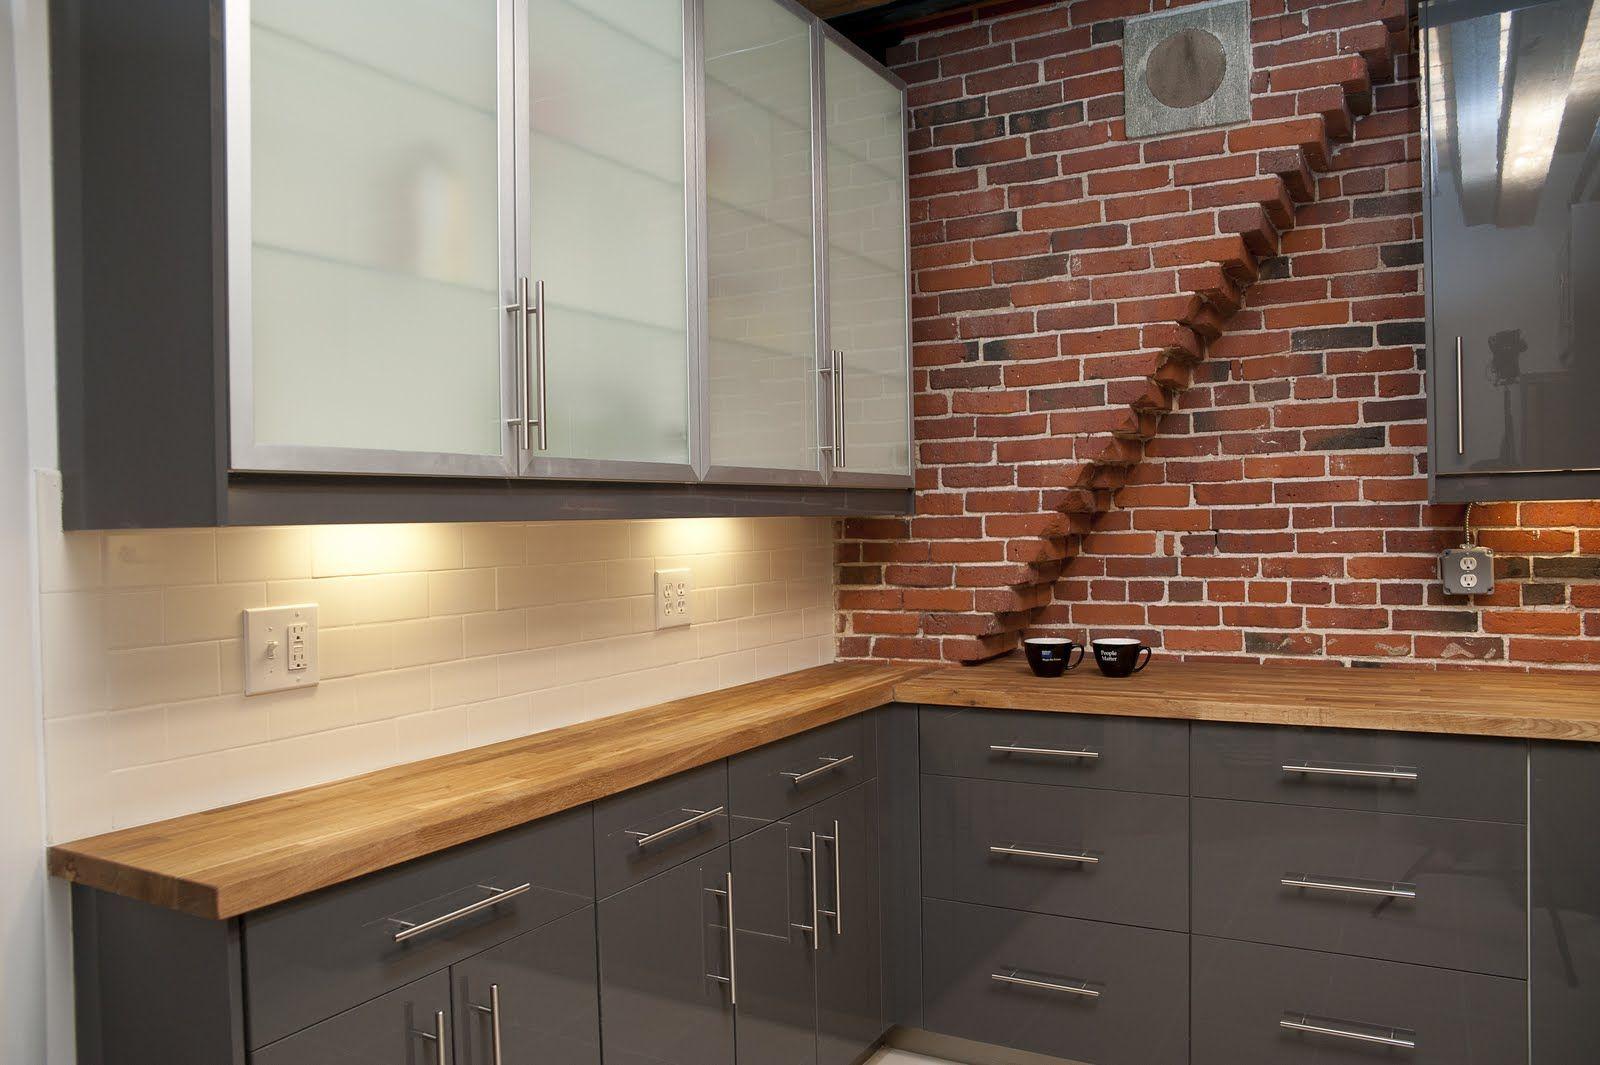 interior brick wall kitchen - google search   art   pinterest